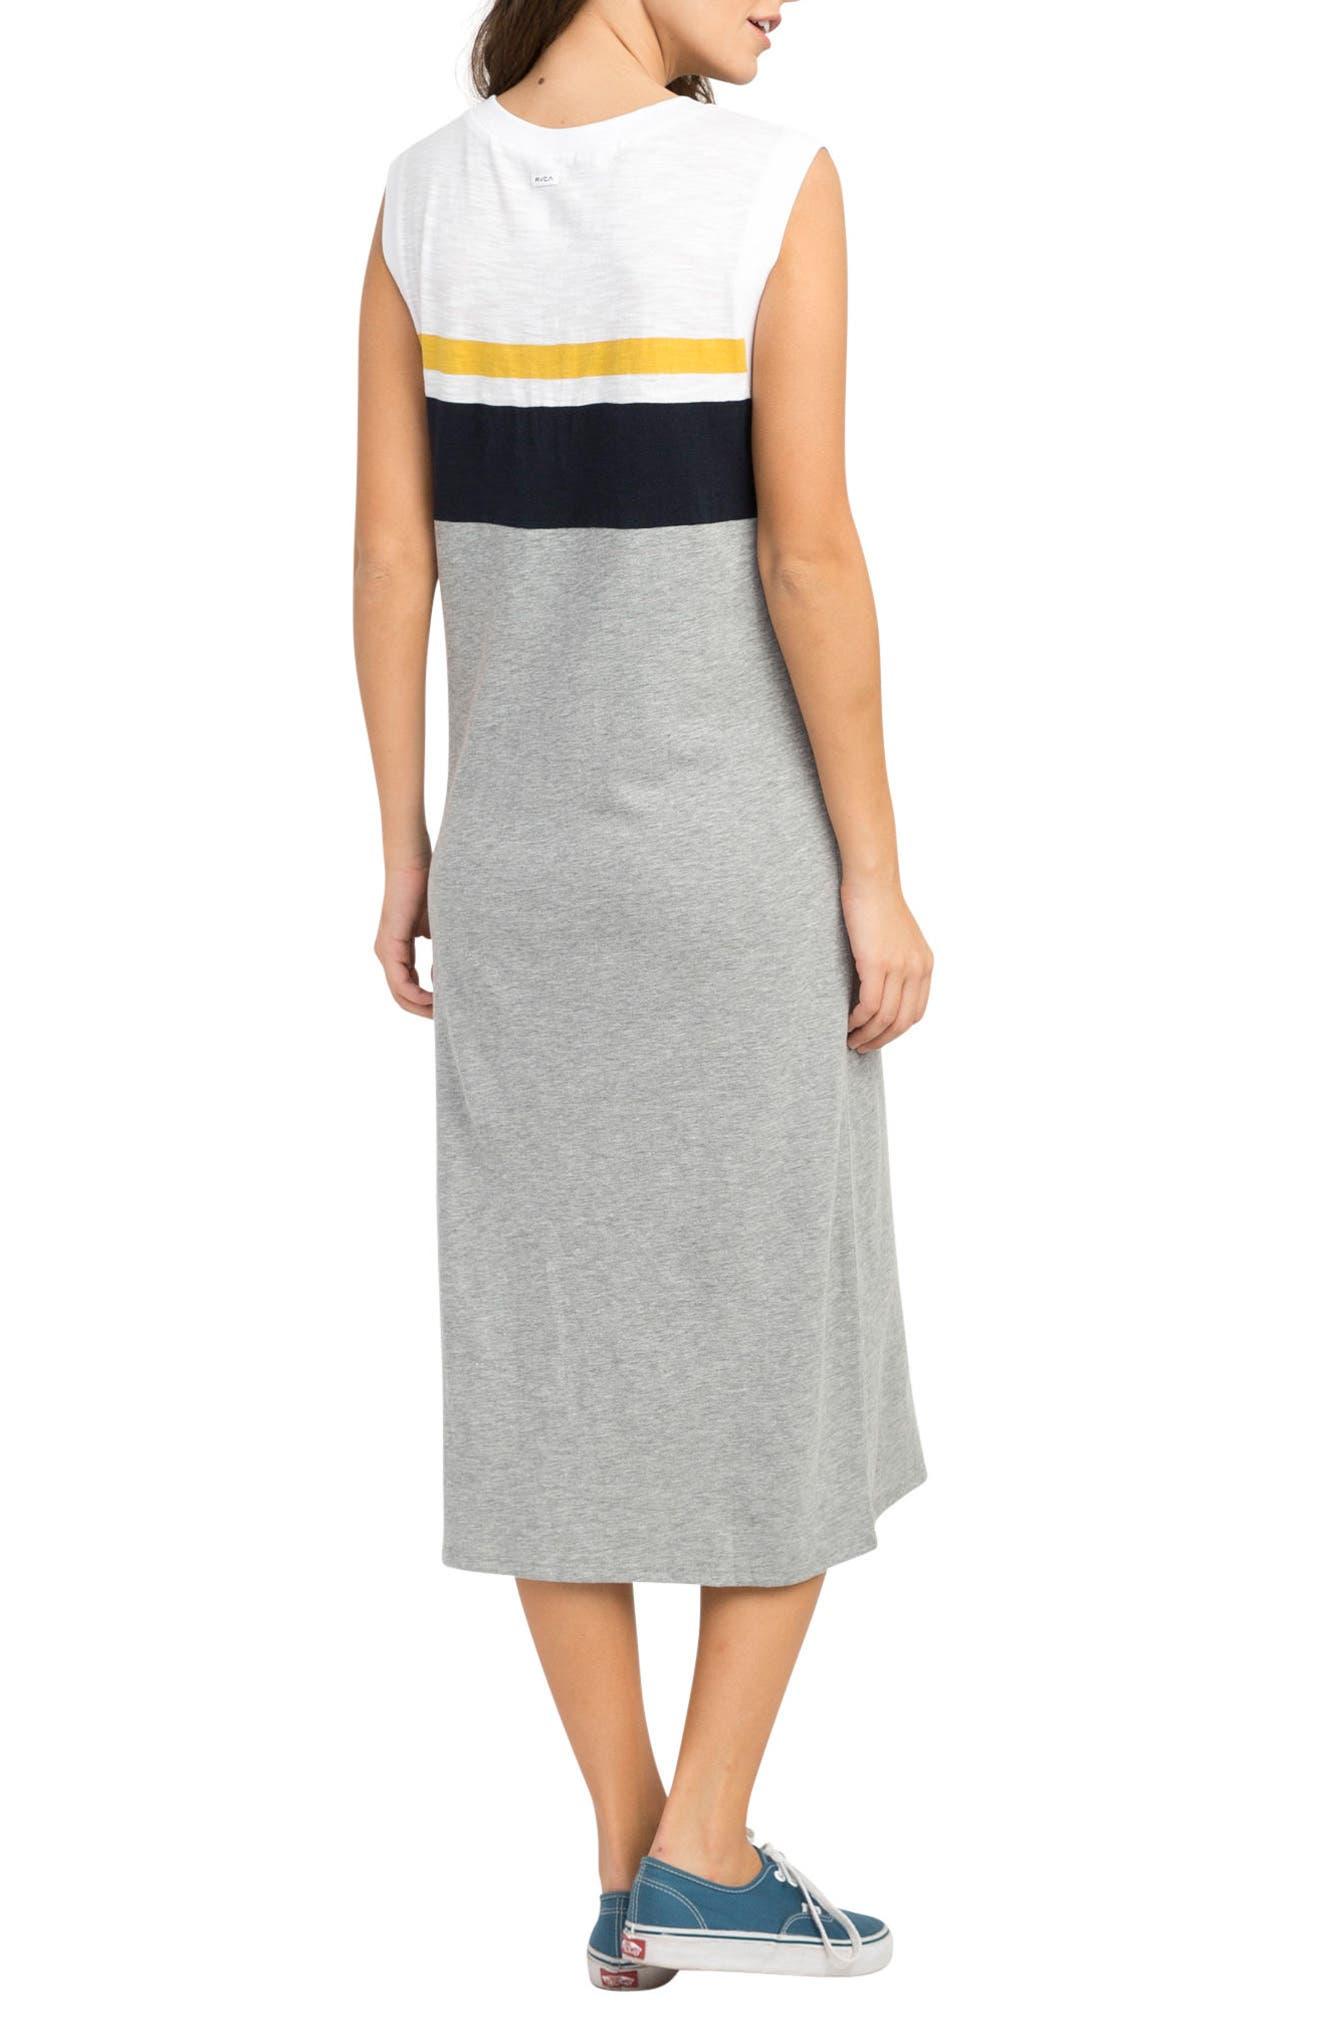 Scorekeeper Midi Dress,                             Alternate thumbnail 2, color,                             054